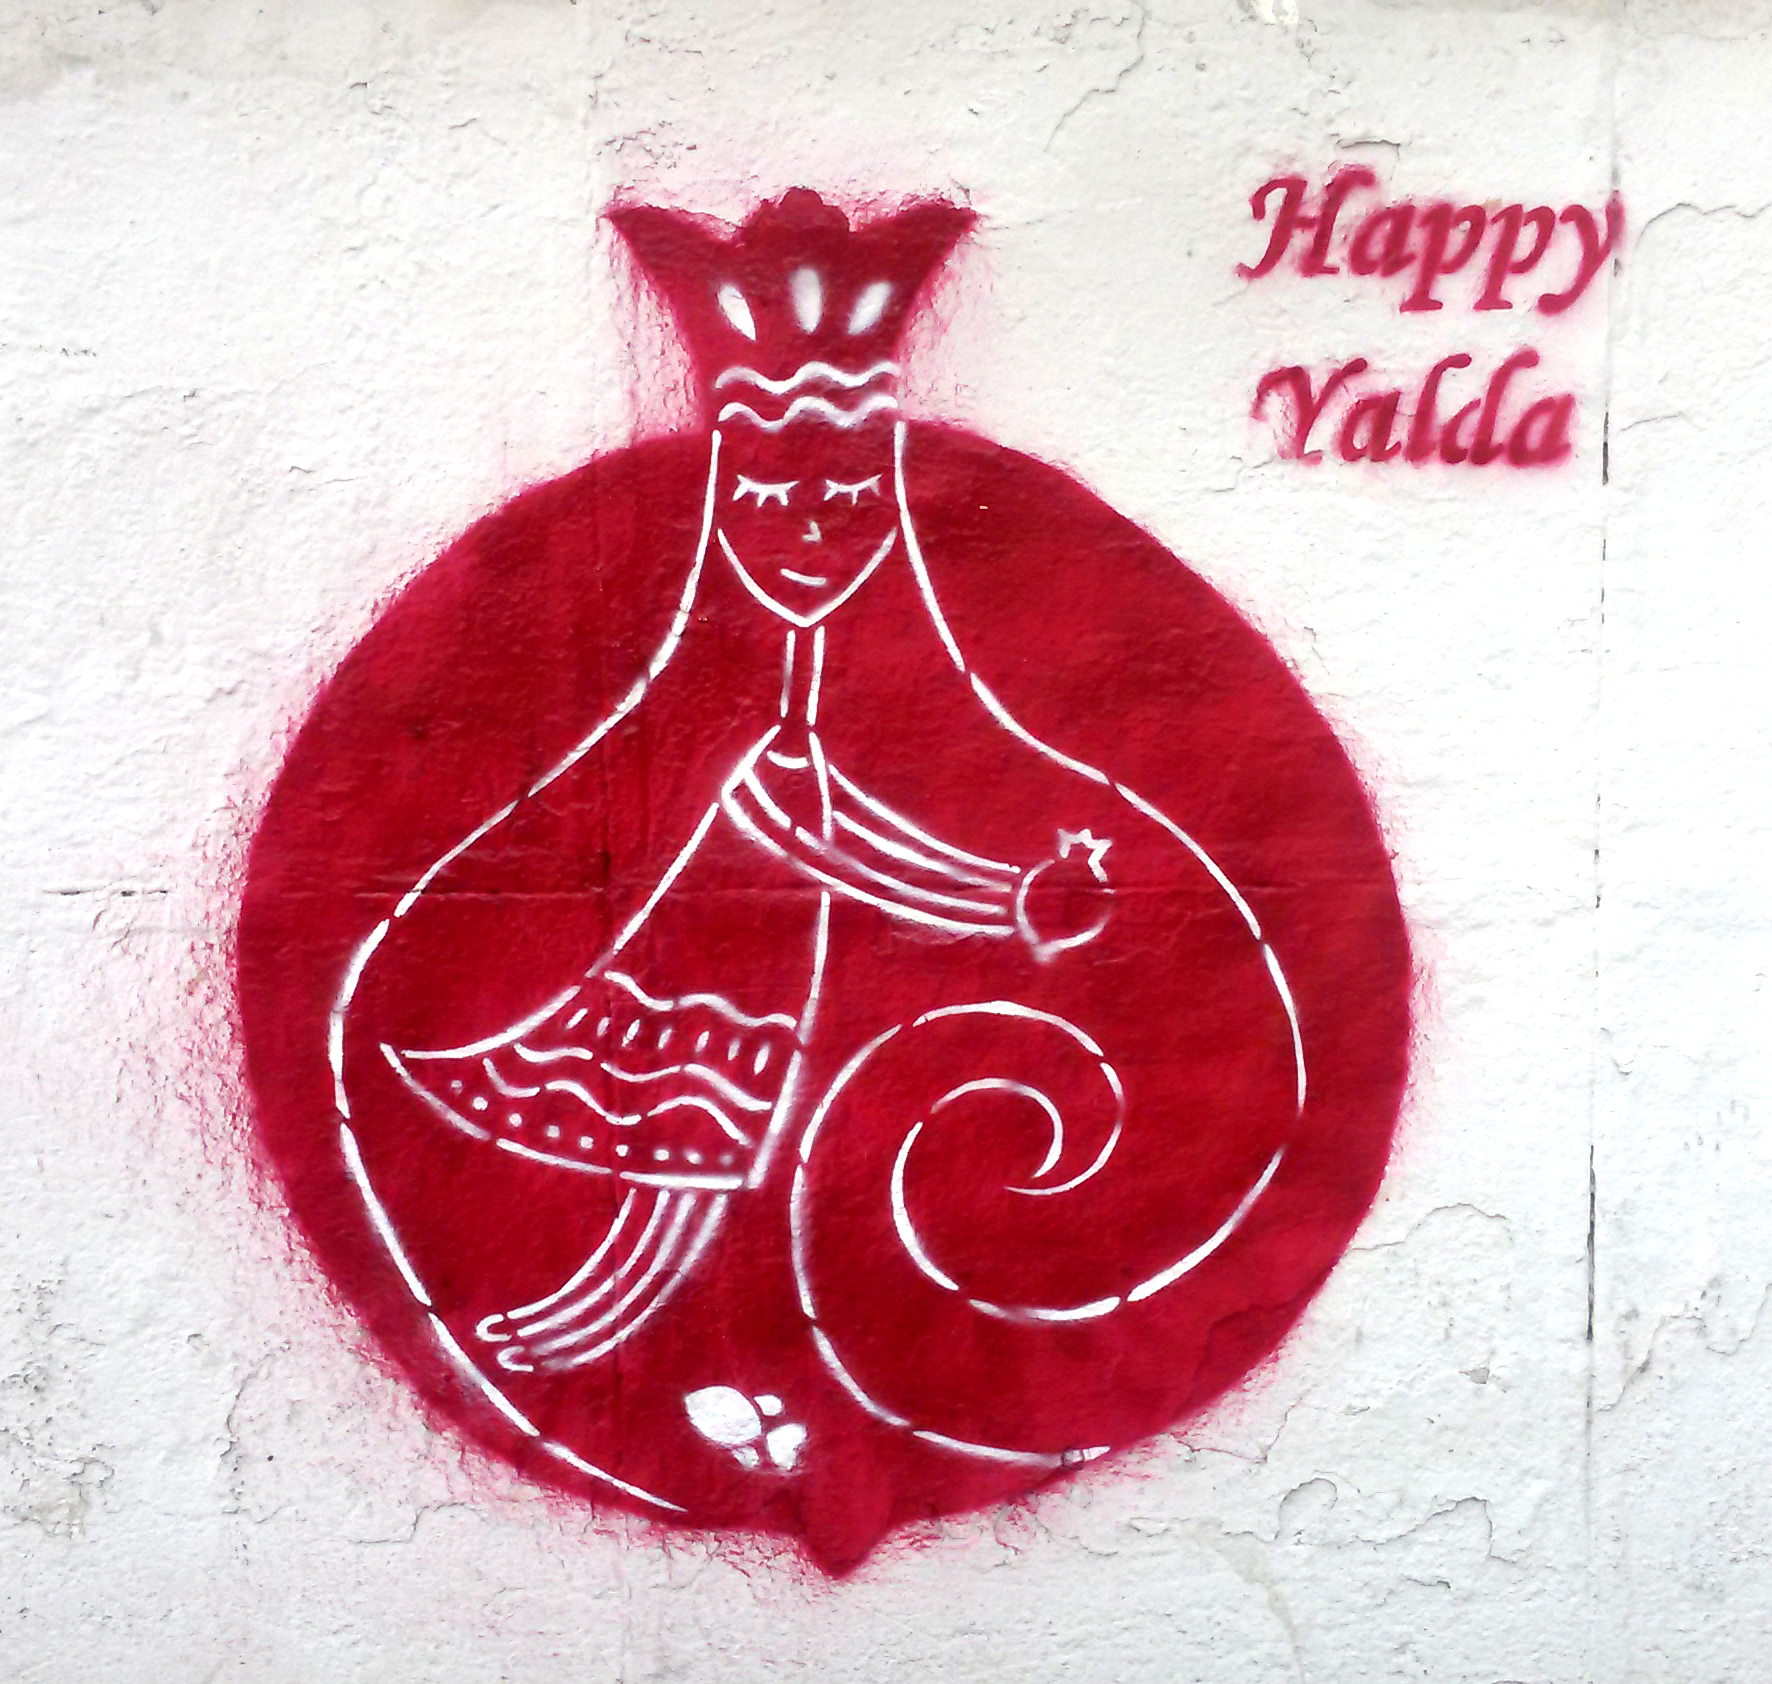 graffiti irangraffiti daydreamer sir.daydreamer tehran iran streetart  Pomegranate yalda happy گرافیتی خیالباف هنر شهری ماهی انار یلدا دختر ایران تهران